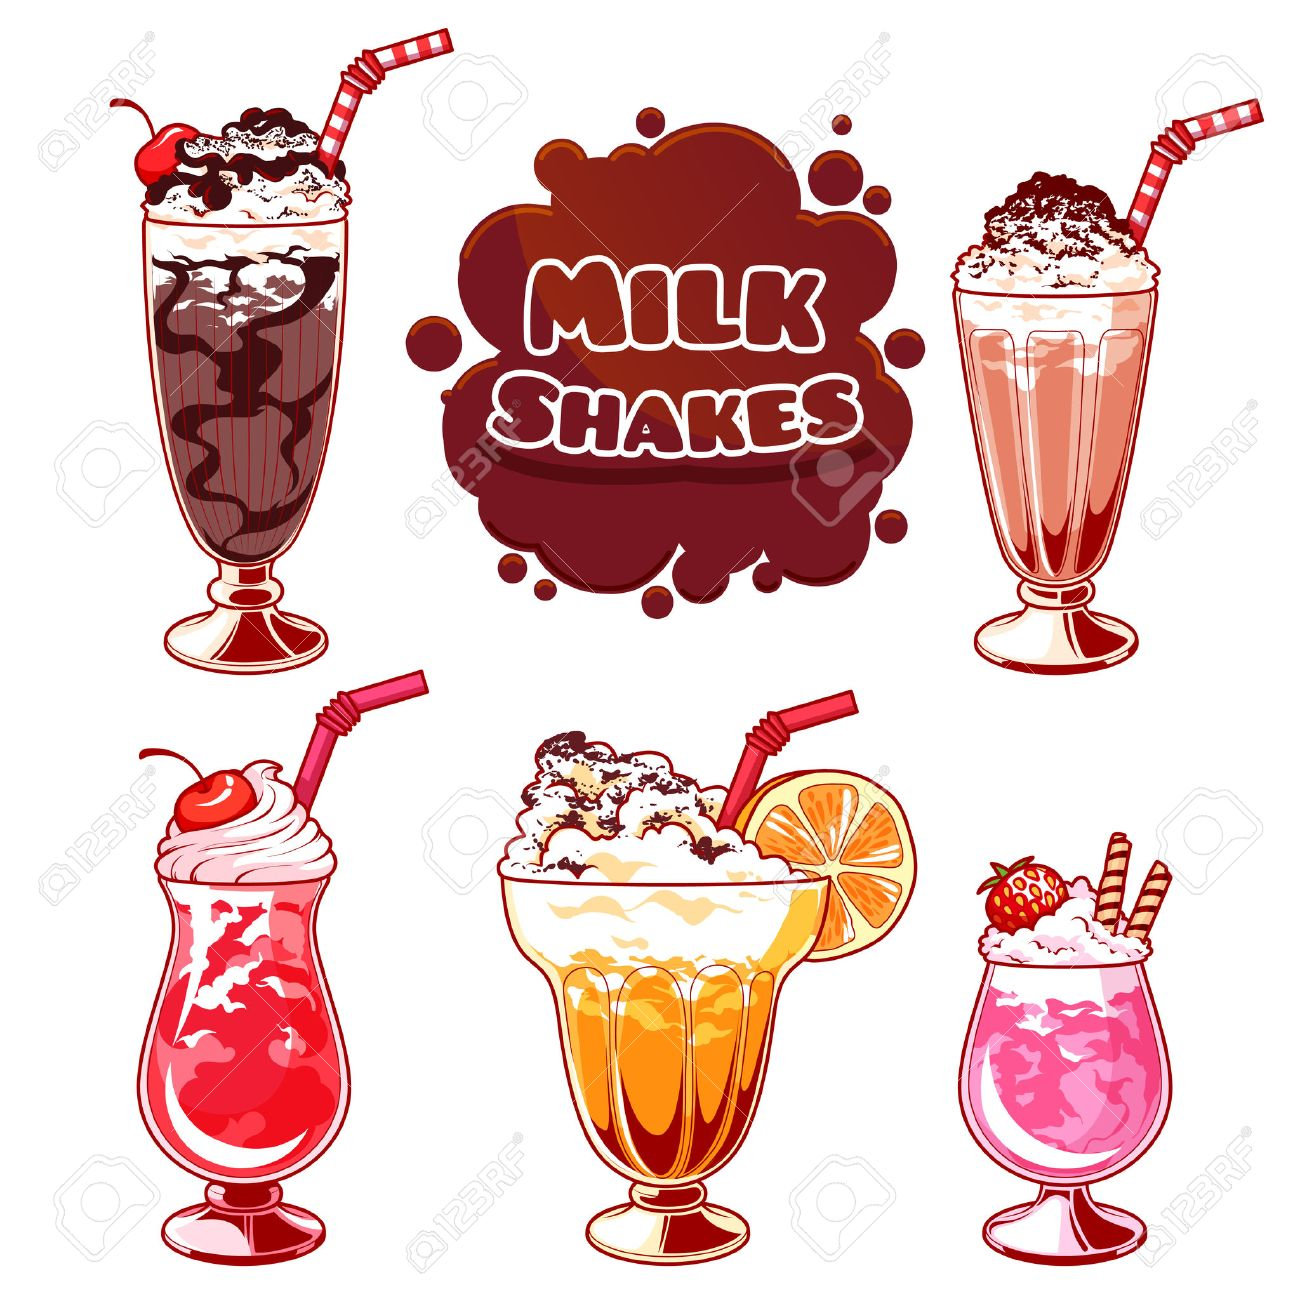 Ensemble De Différents Milkshakes Chocolate Milk Shake Milk Shake